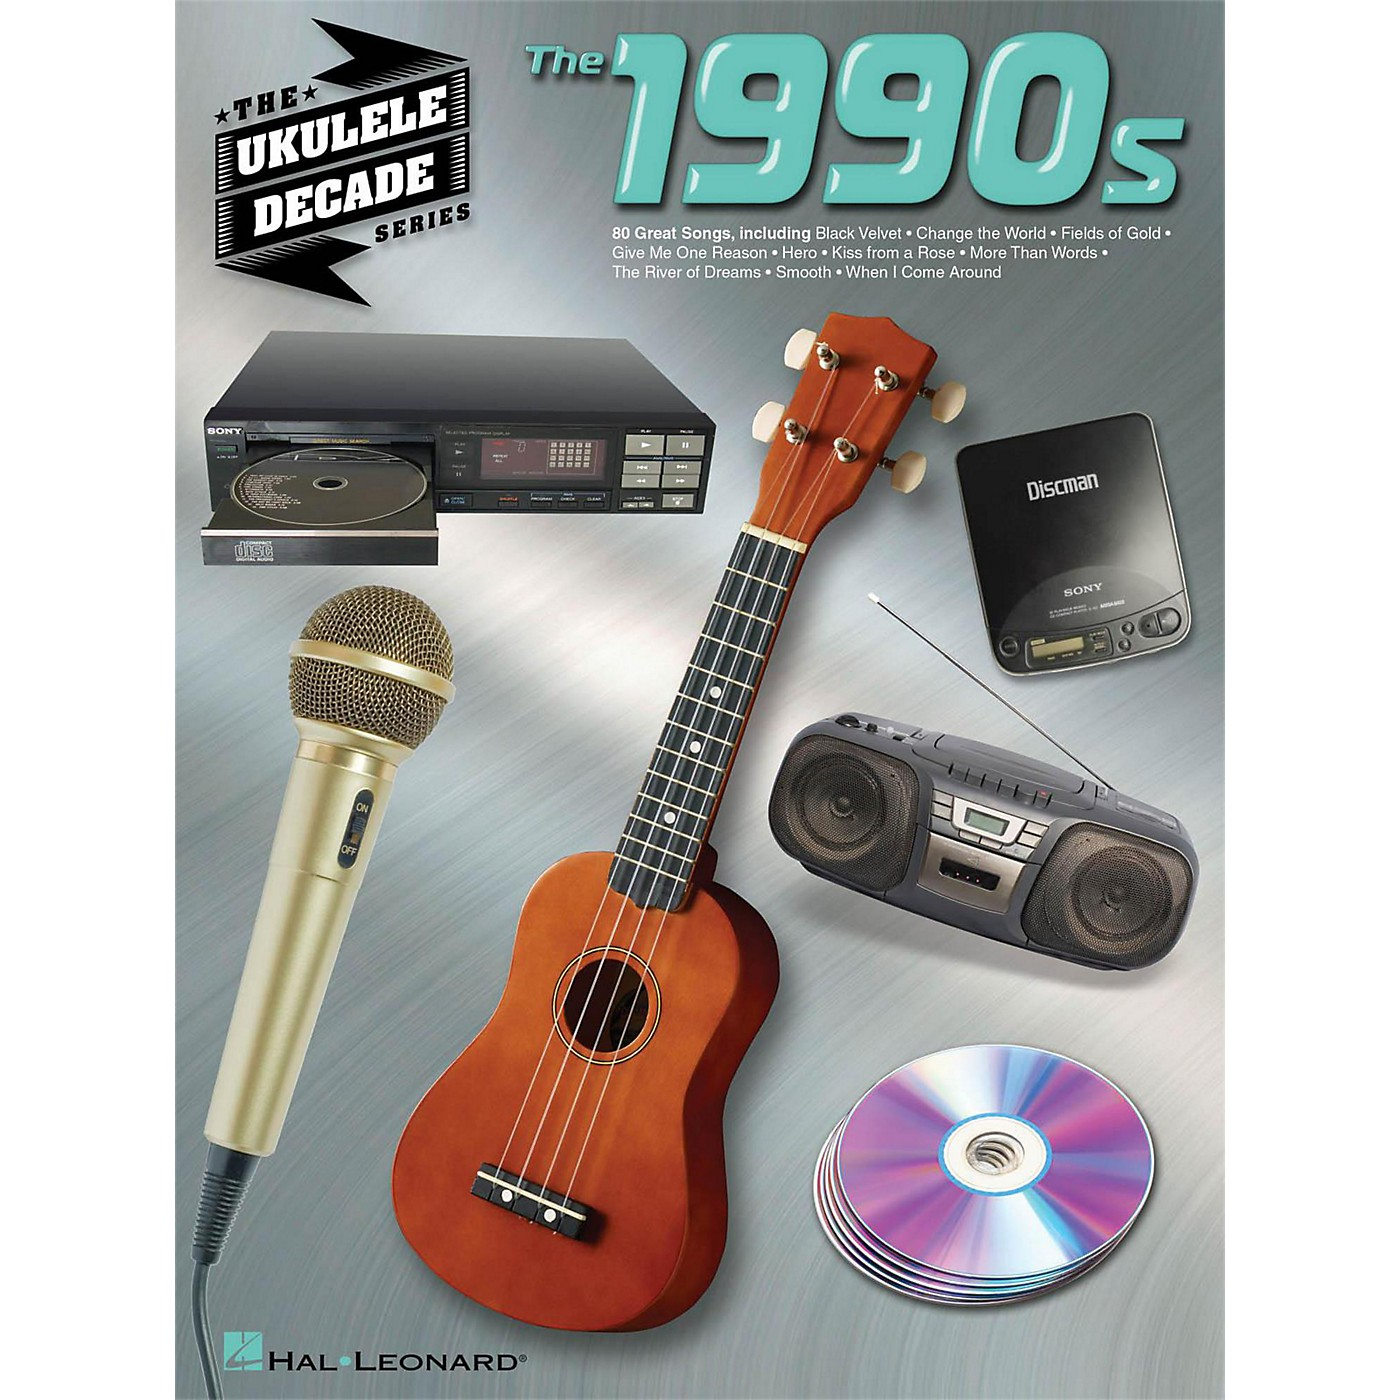 Hal Leonard The 1990s - The Ukulele Decade Series thumbnail